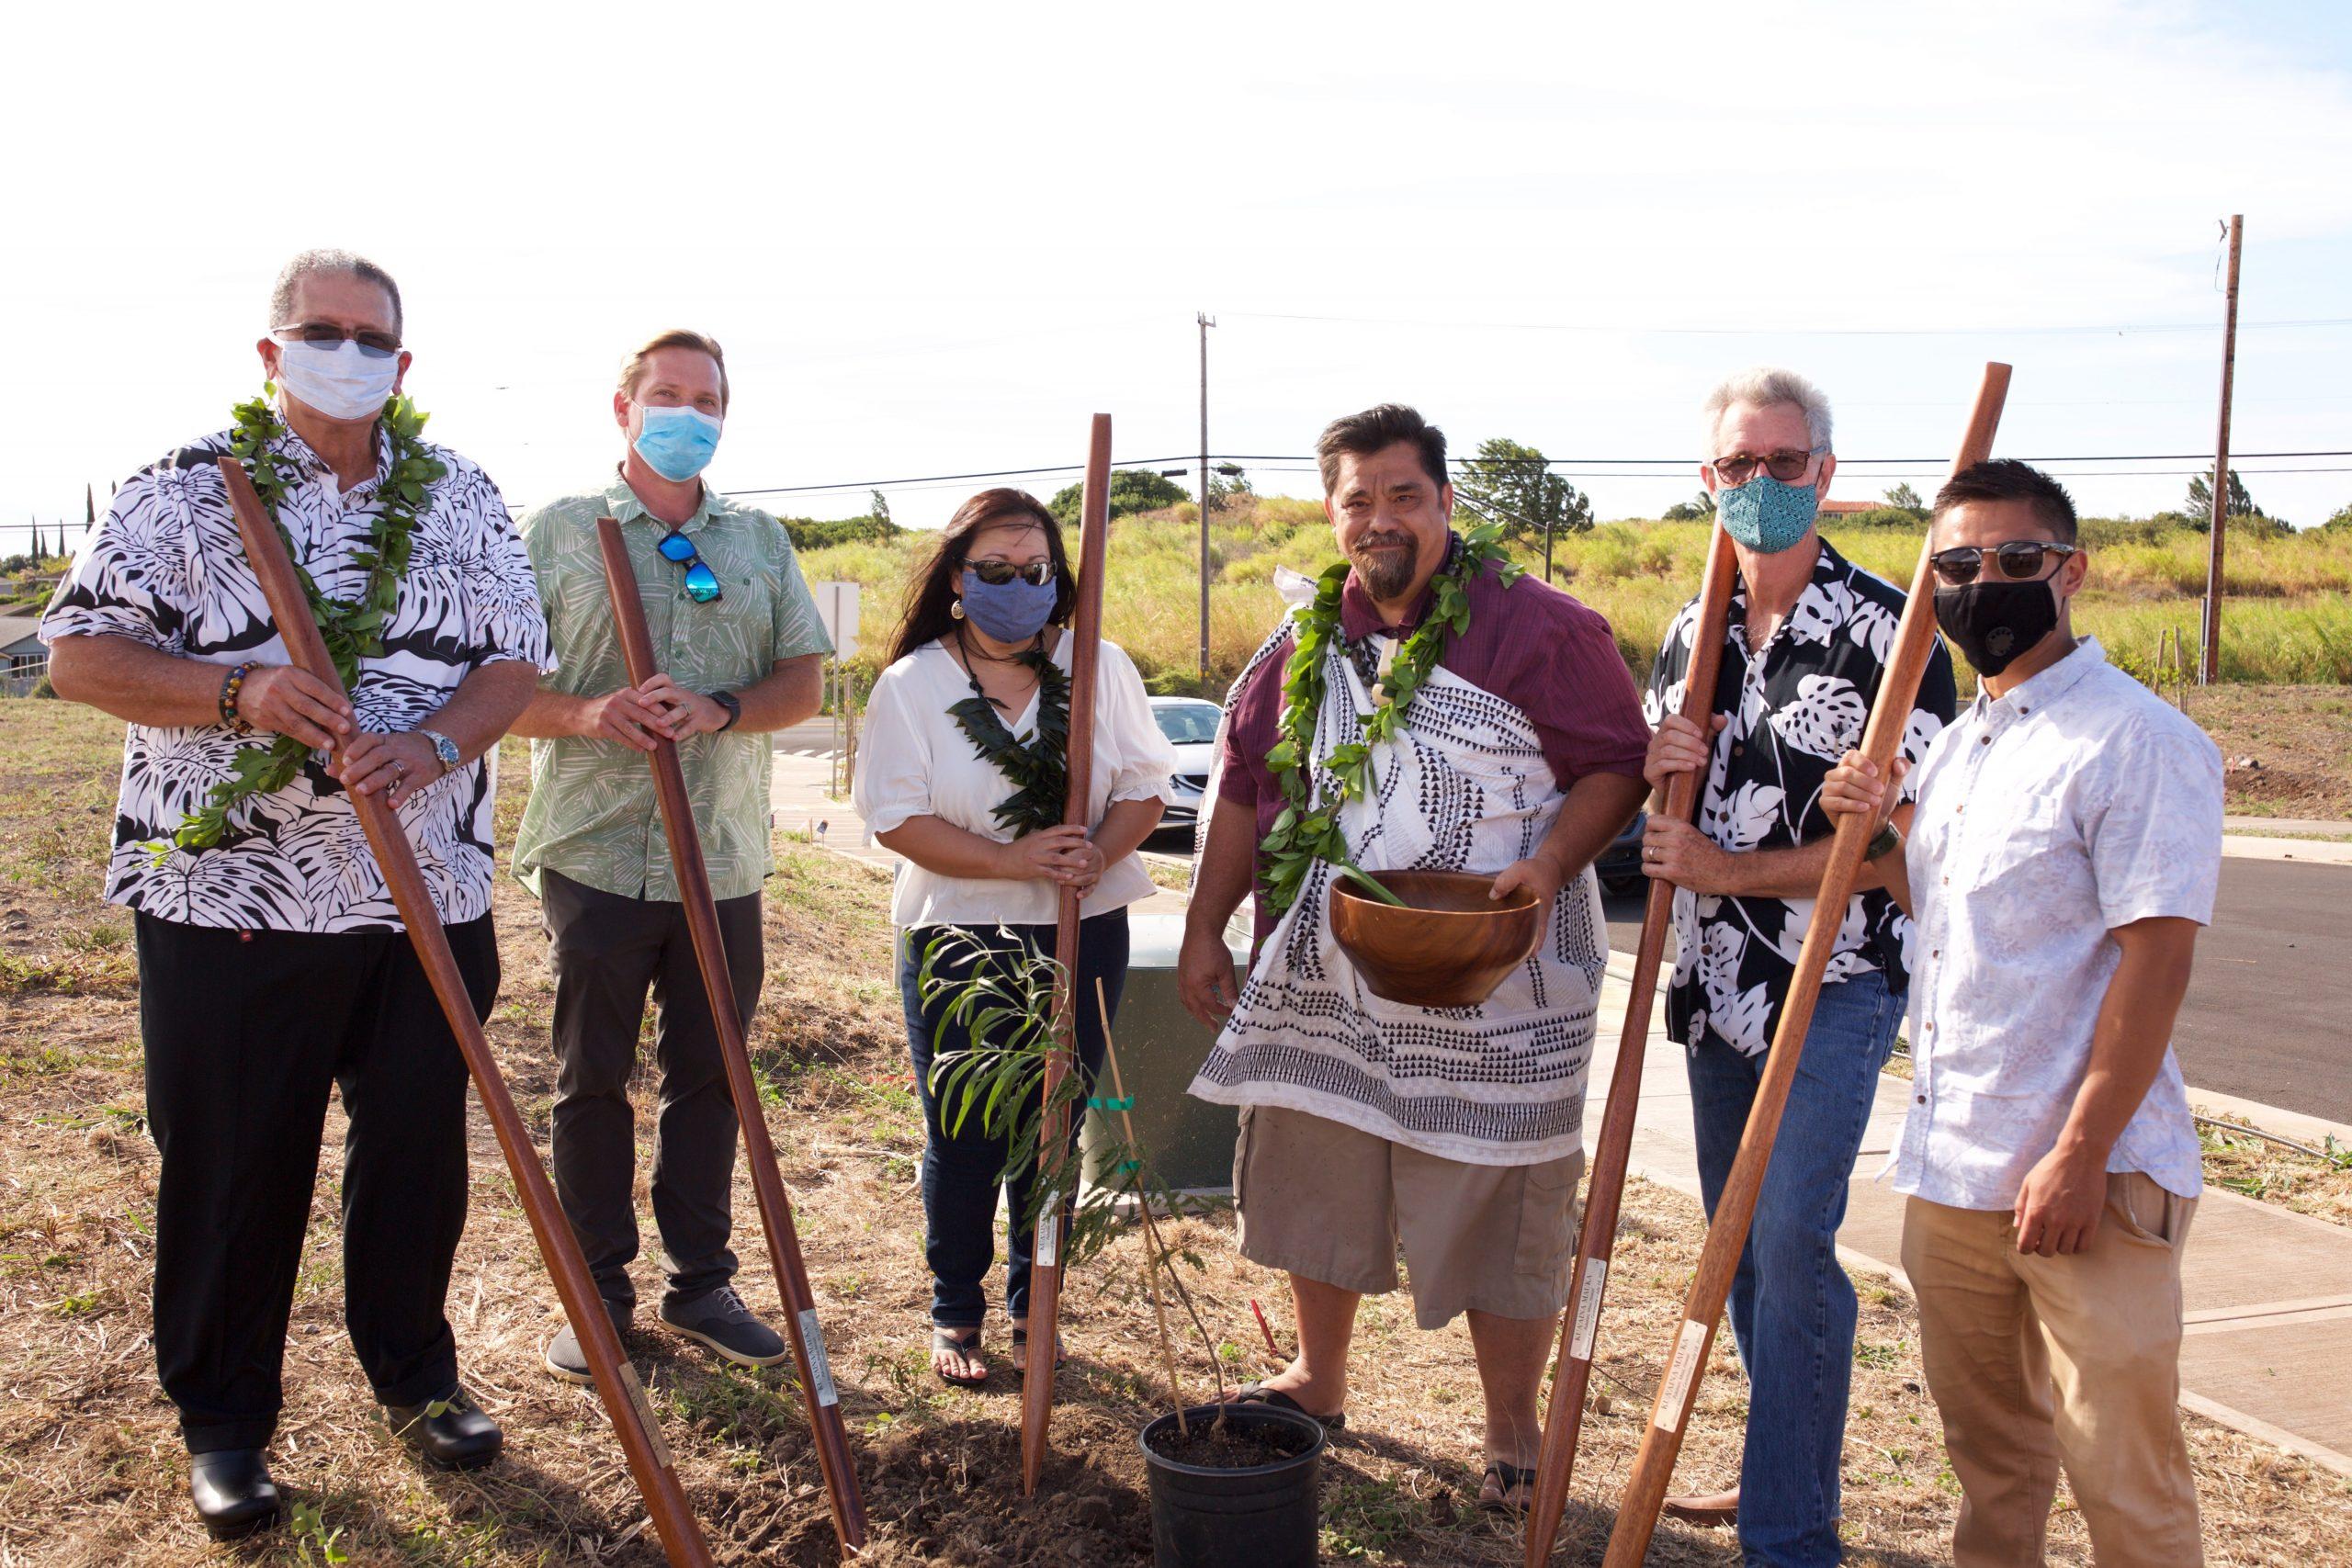 Construction Begins at Kua'āina Mauka 32-Home Community in Pukalani